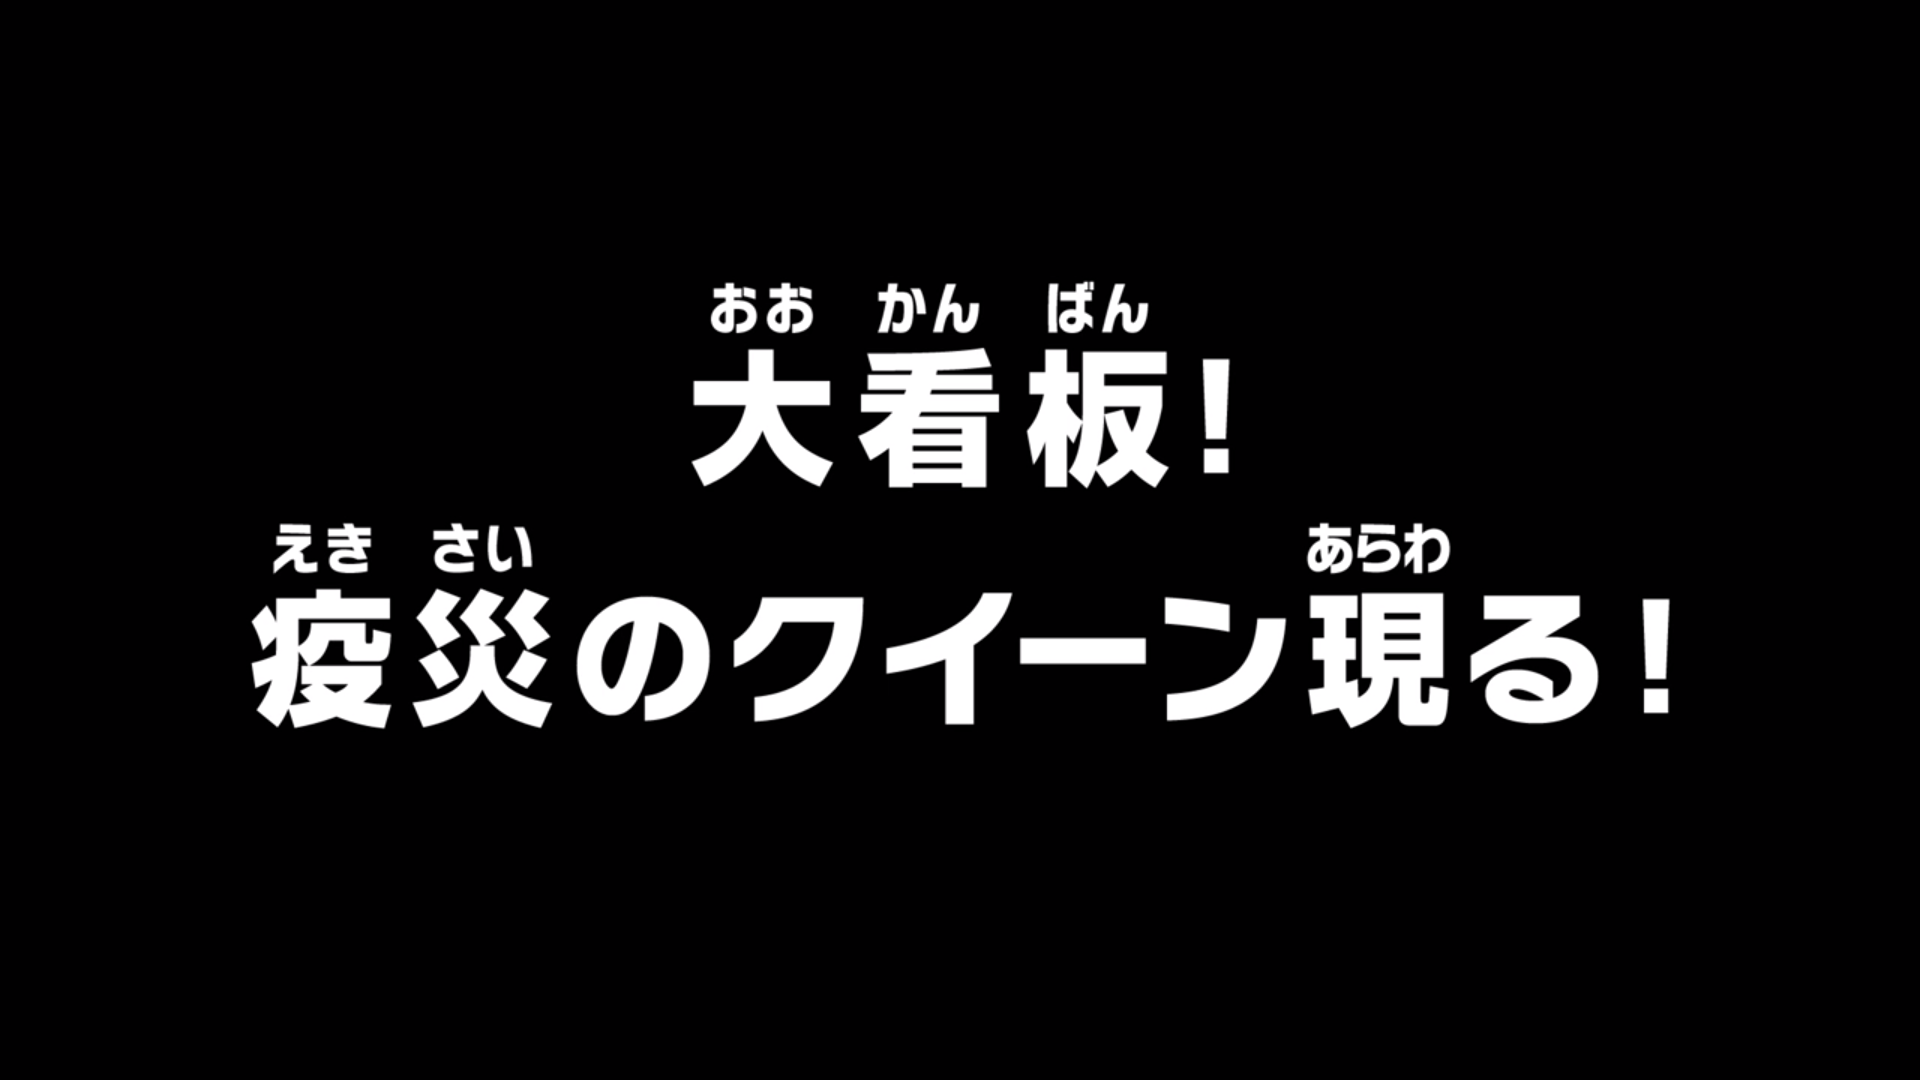 Episode 930